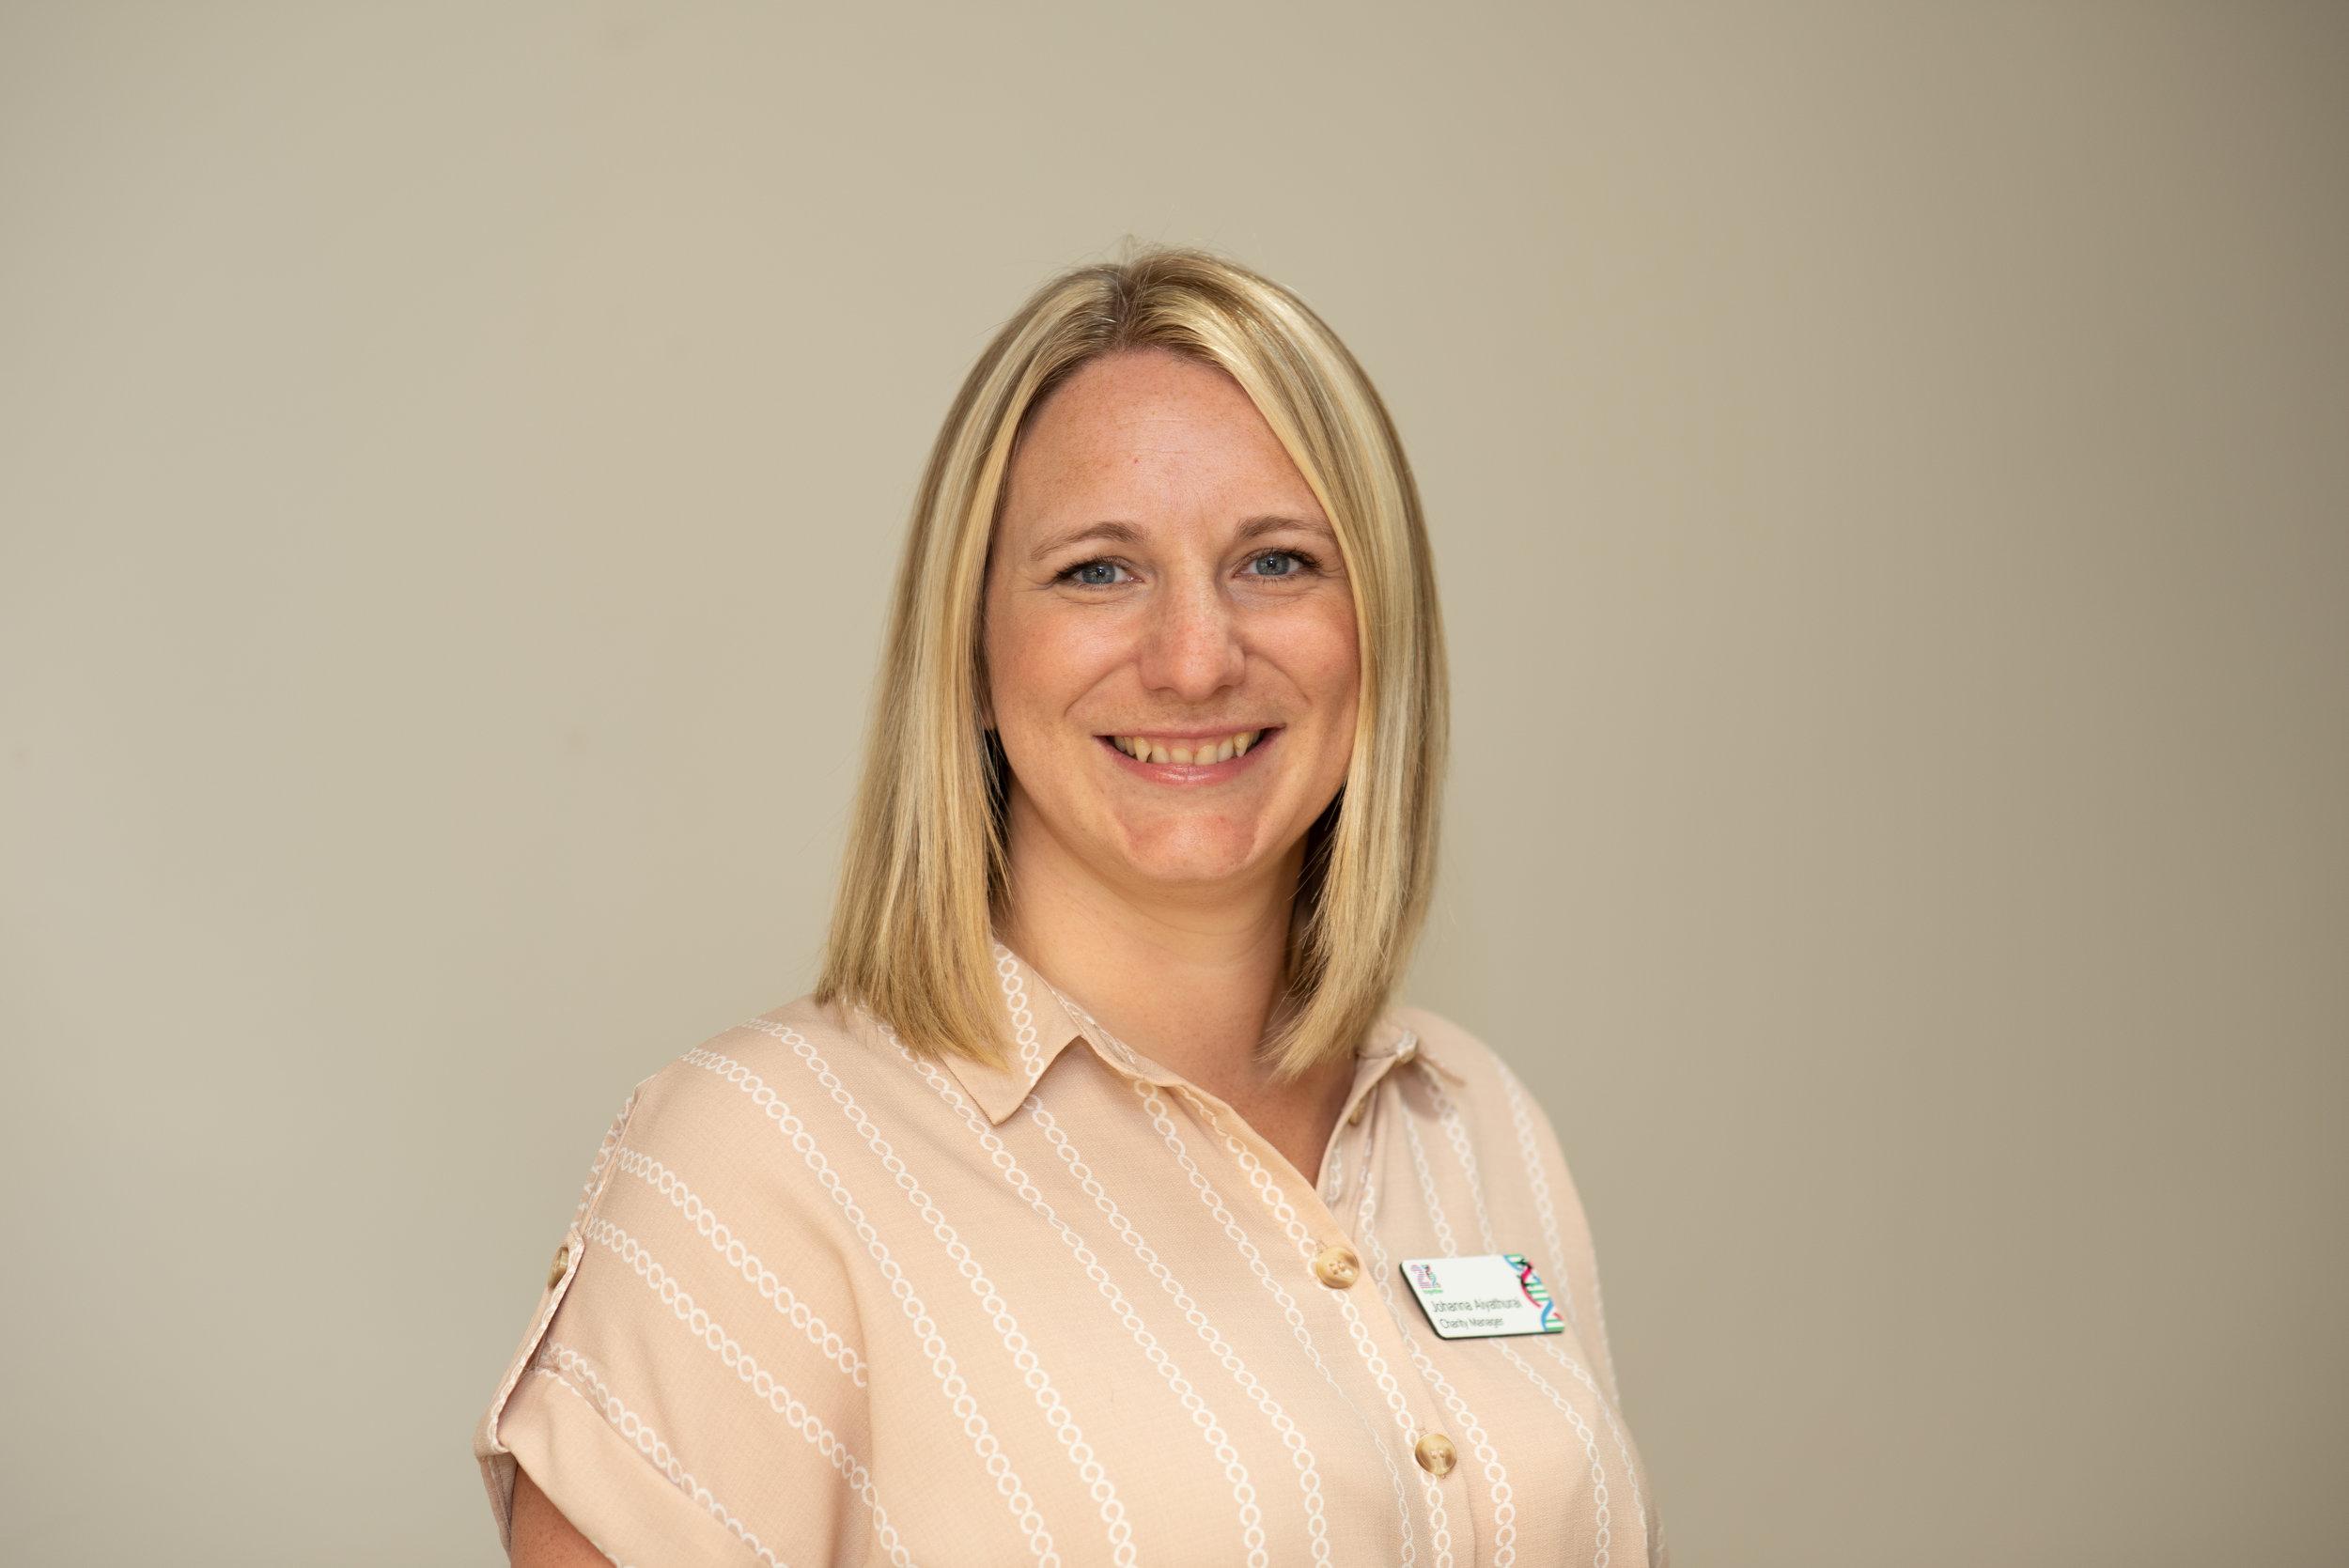 Johanna Aiyathurai - Manager